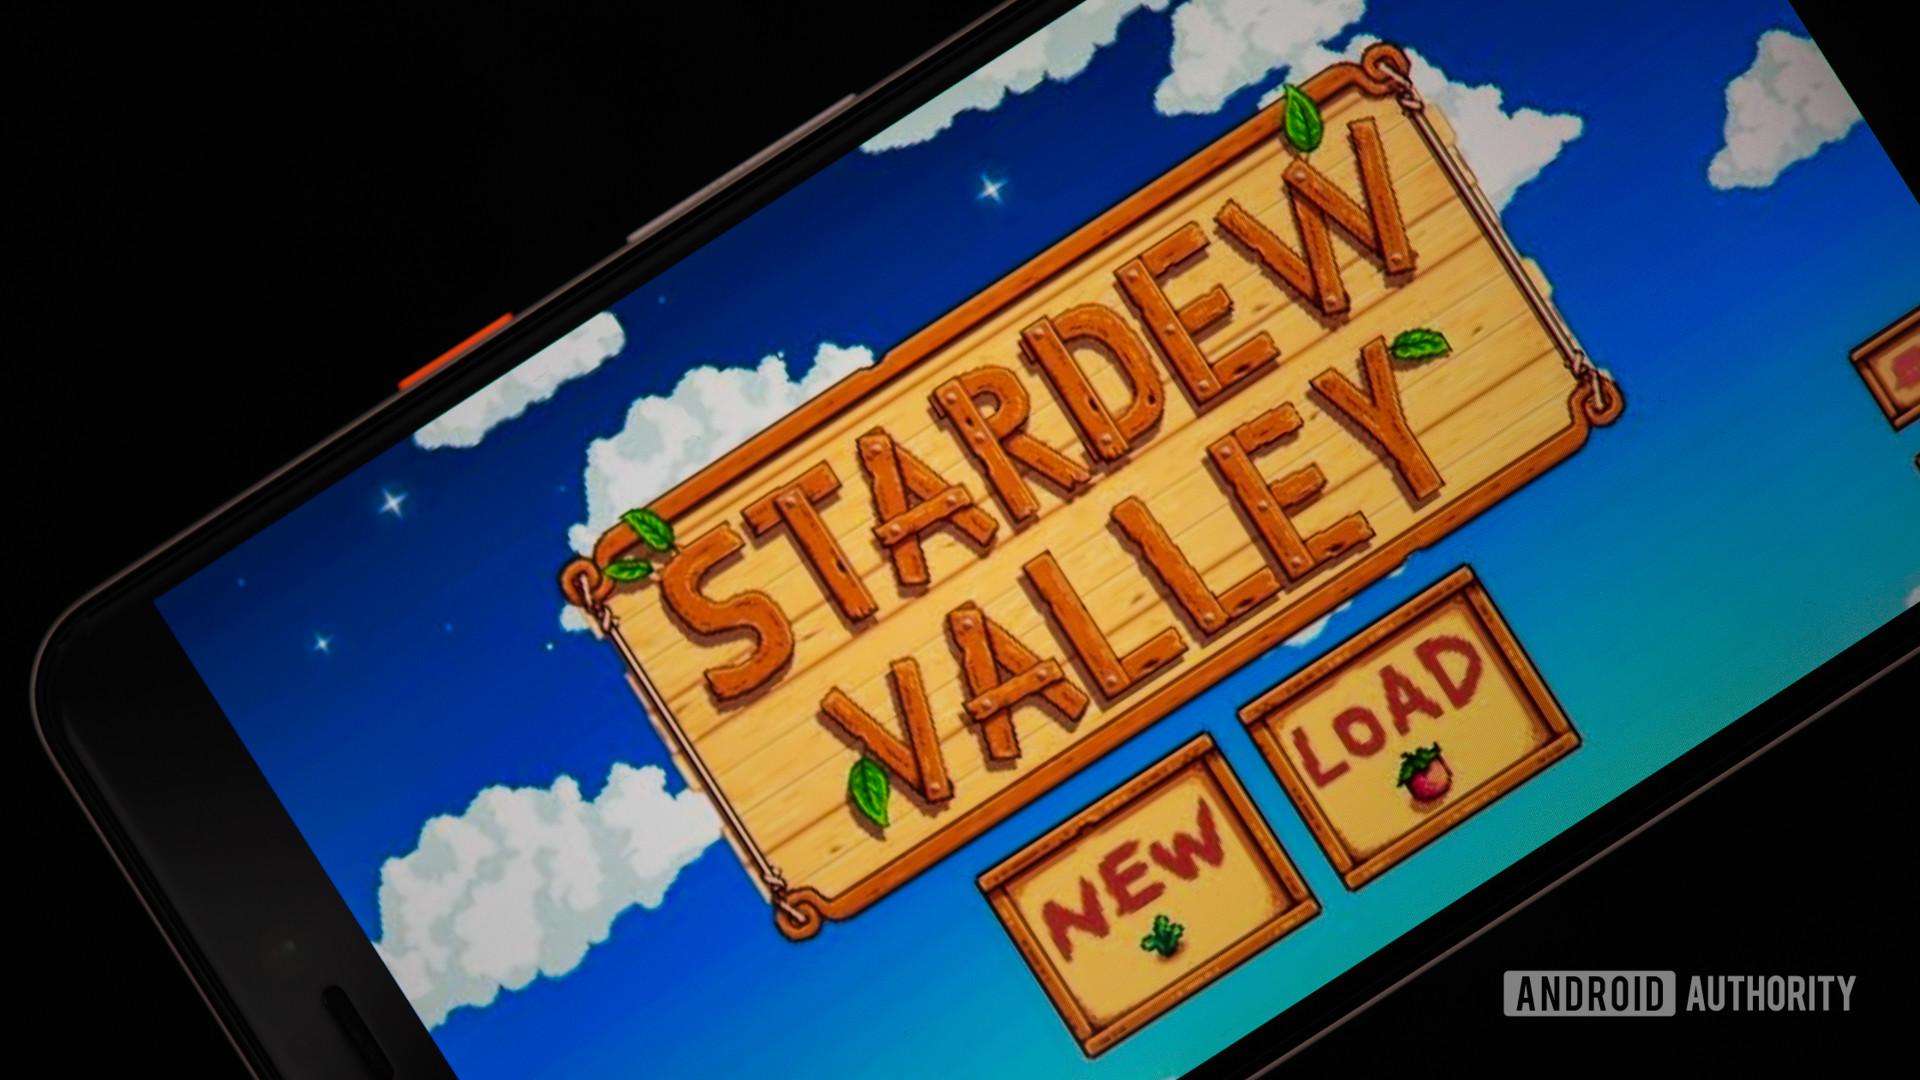 Stardew Valley game stock photo 4